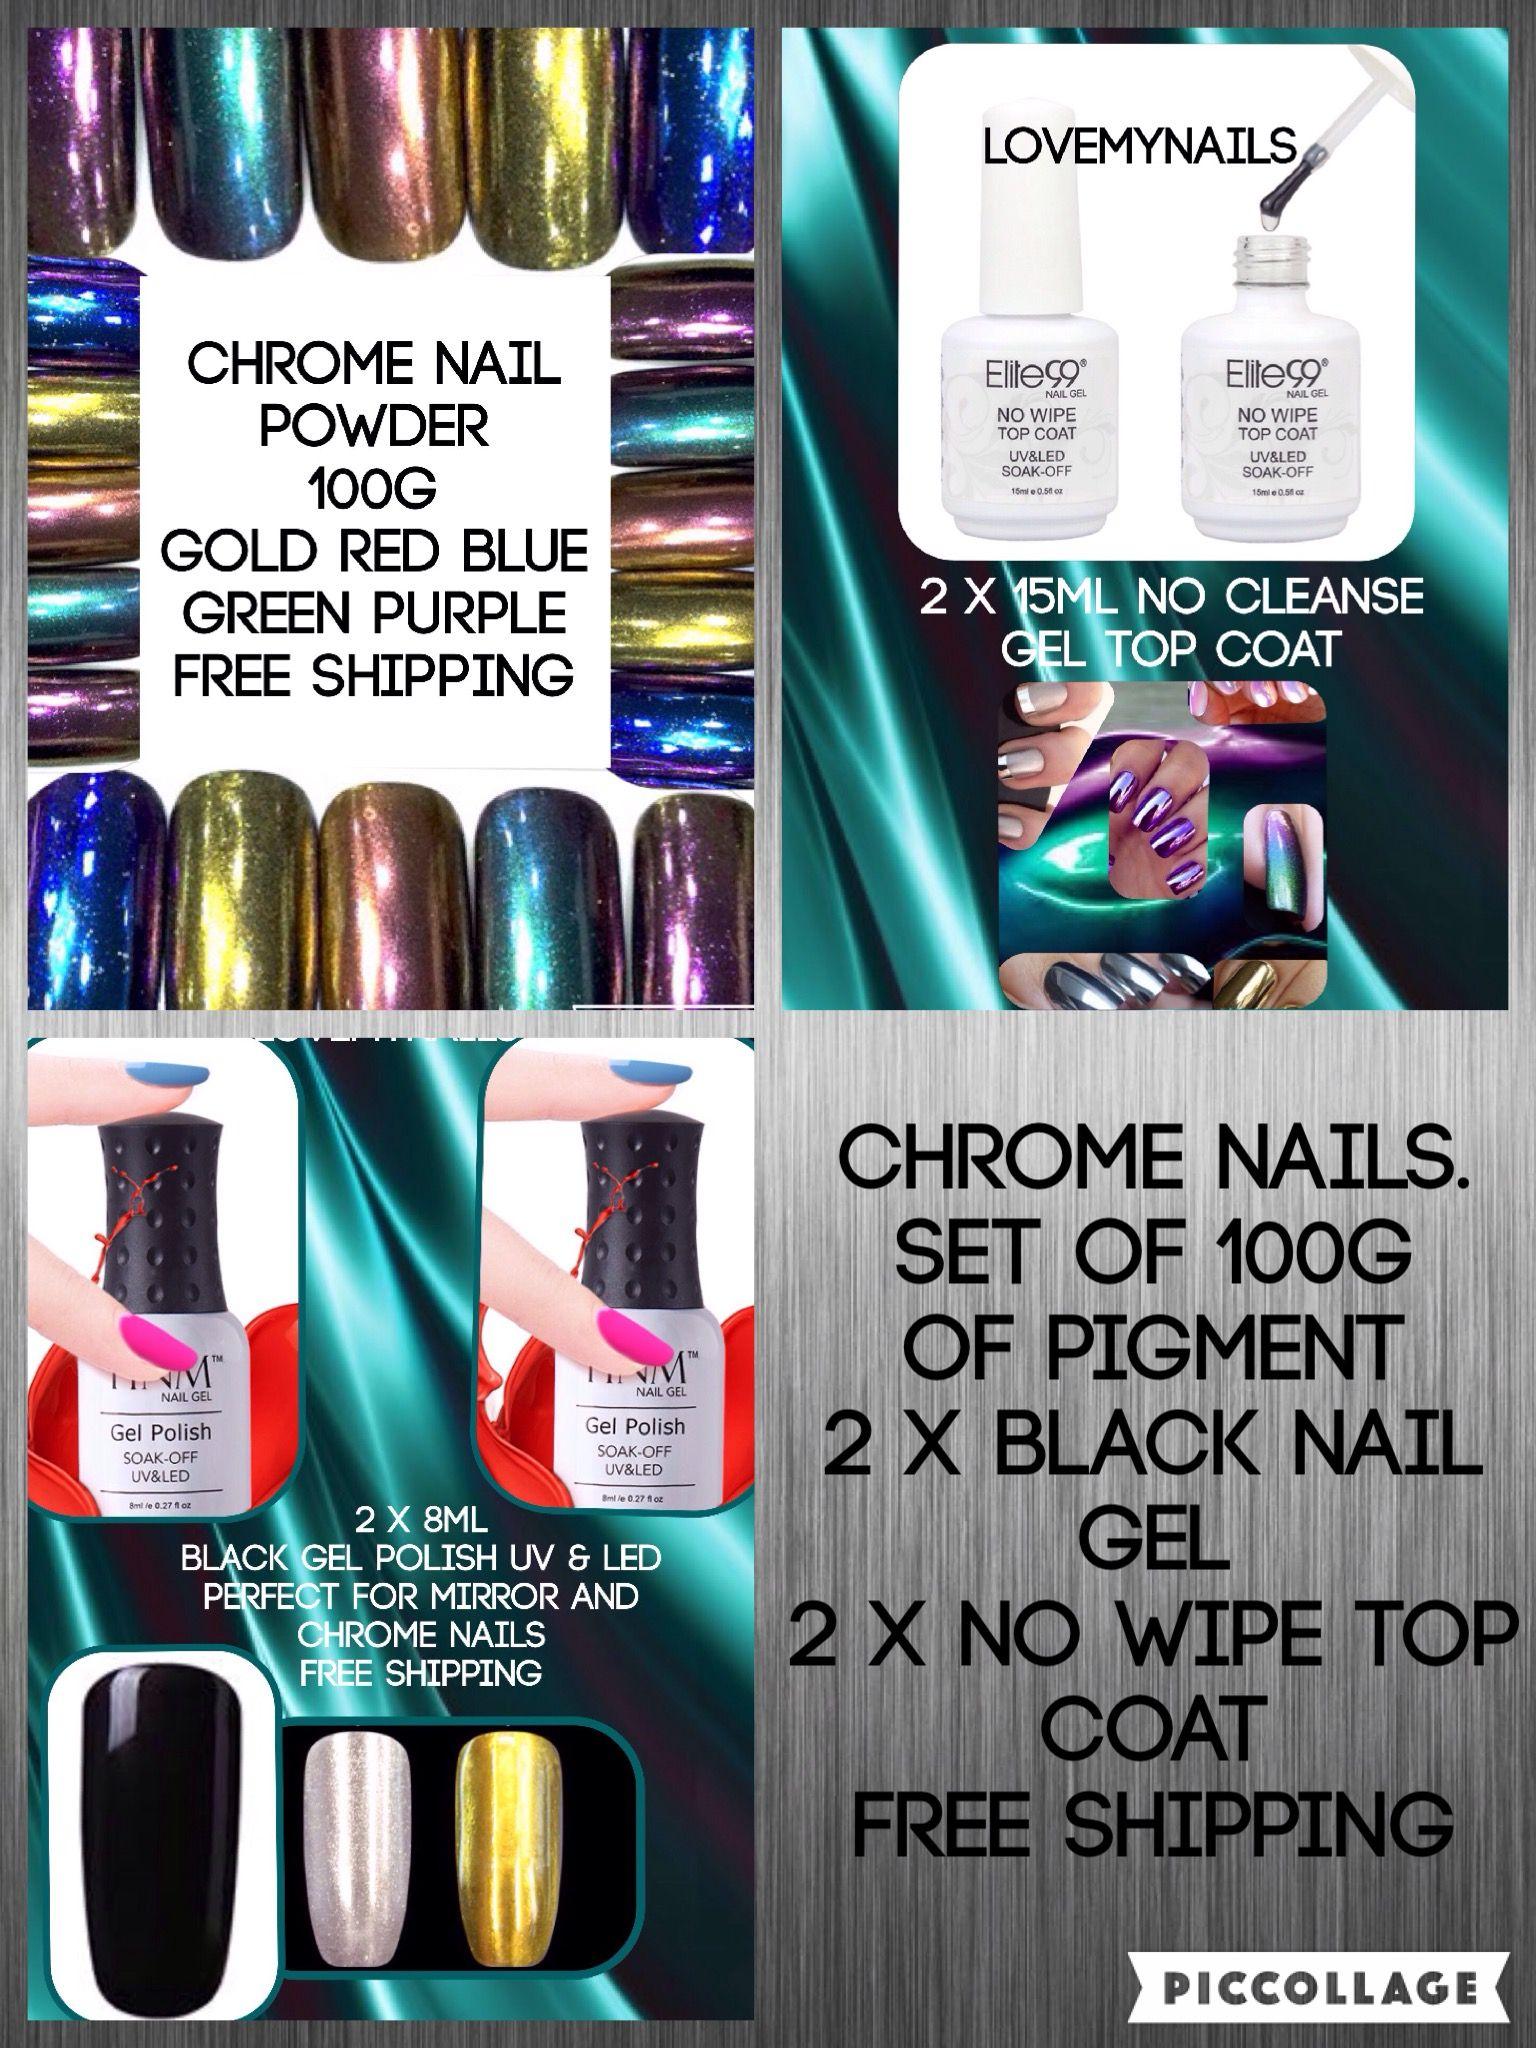 Chrome Nails Mirror Nail Set 100g Mixed Pigment Powder 2 Black Base Coat No Wipe